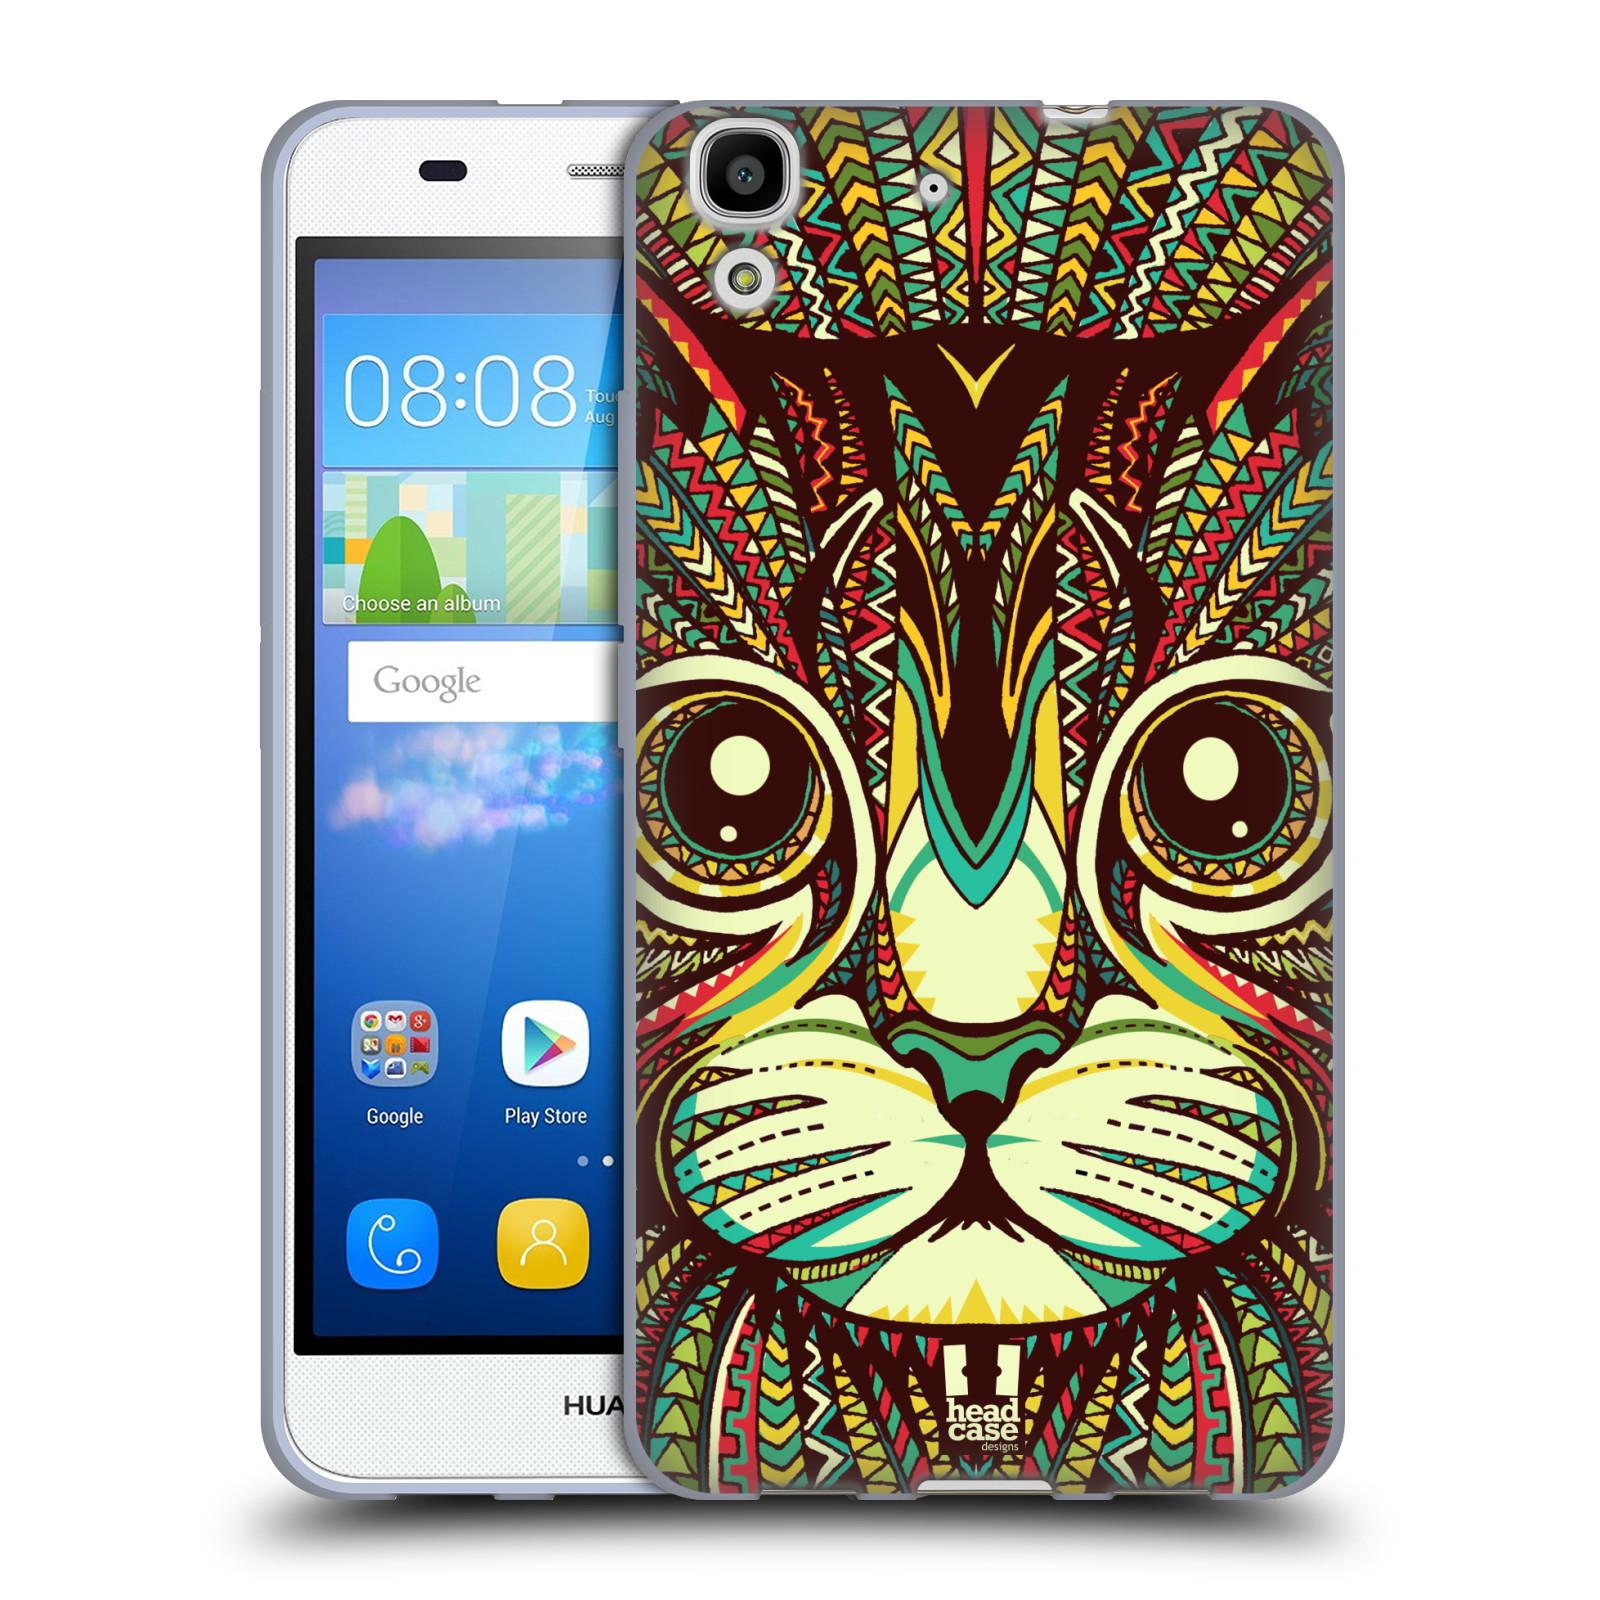 Silikonové pouzdro na mobil Huawei Y6 HEAD CASE AZTEC KOČKA